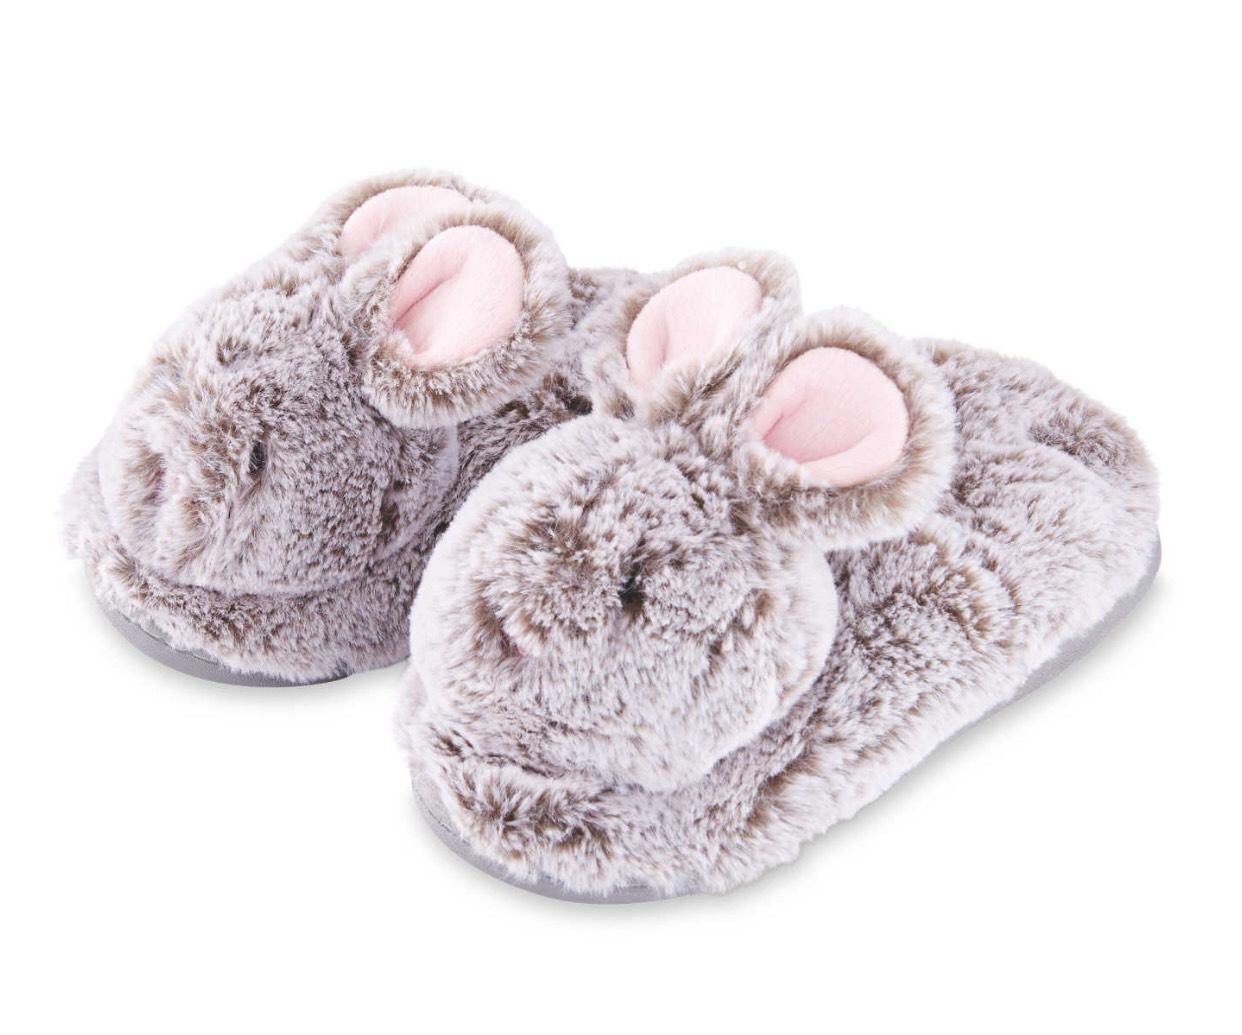 Rabbit Slippers by Lily & Dan Kids £2.49 at Aldi